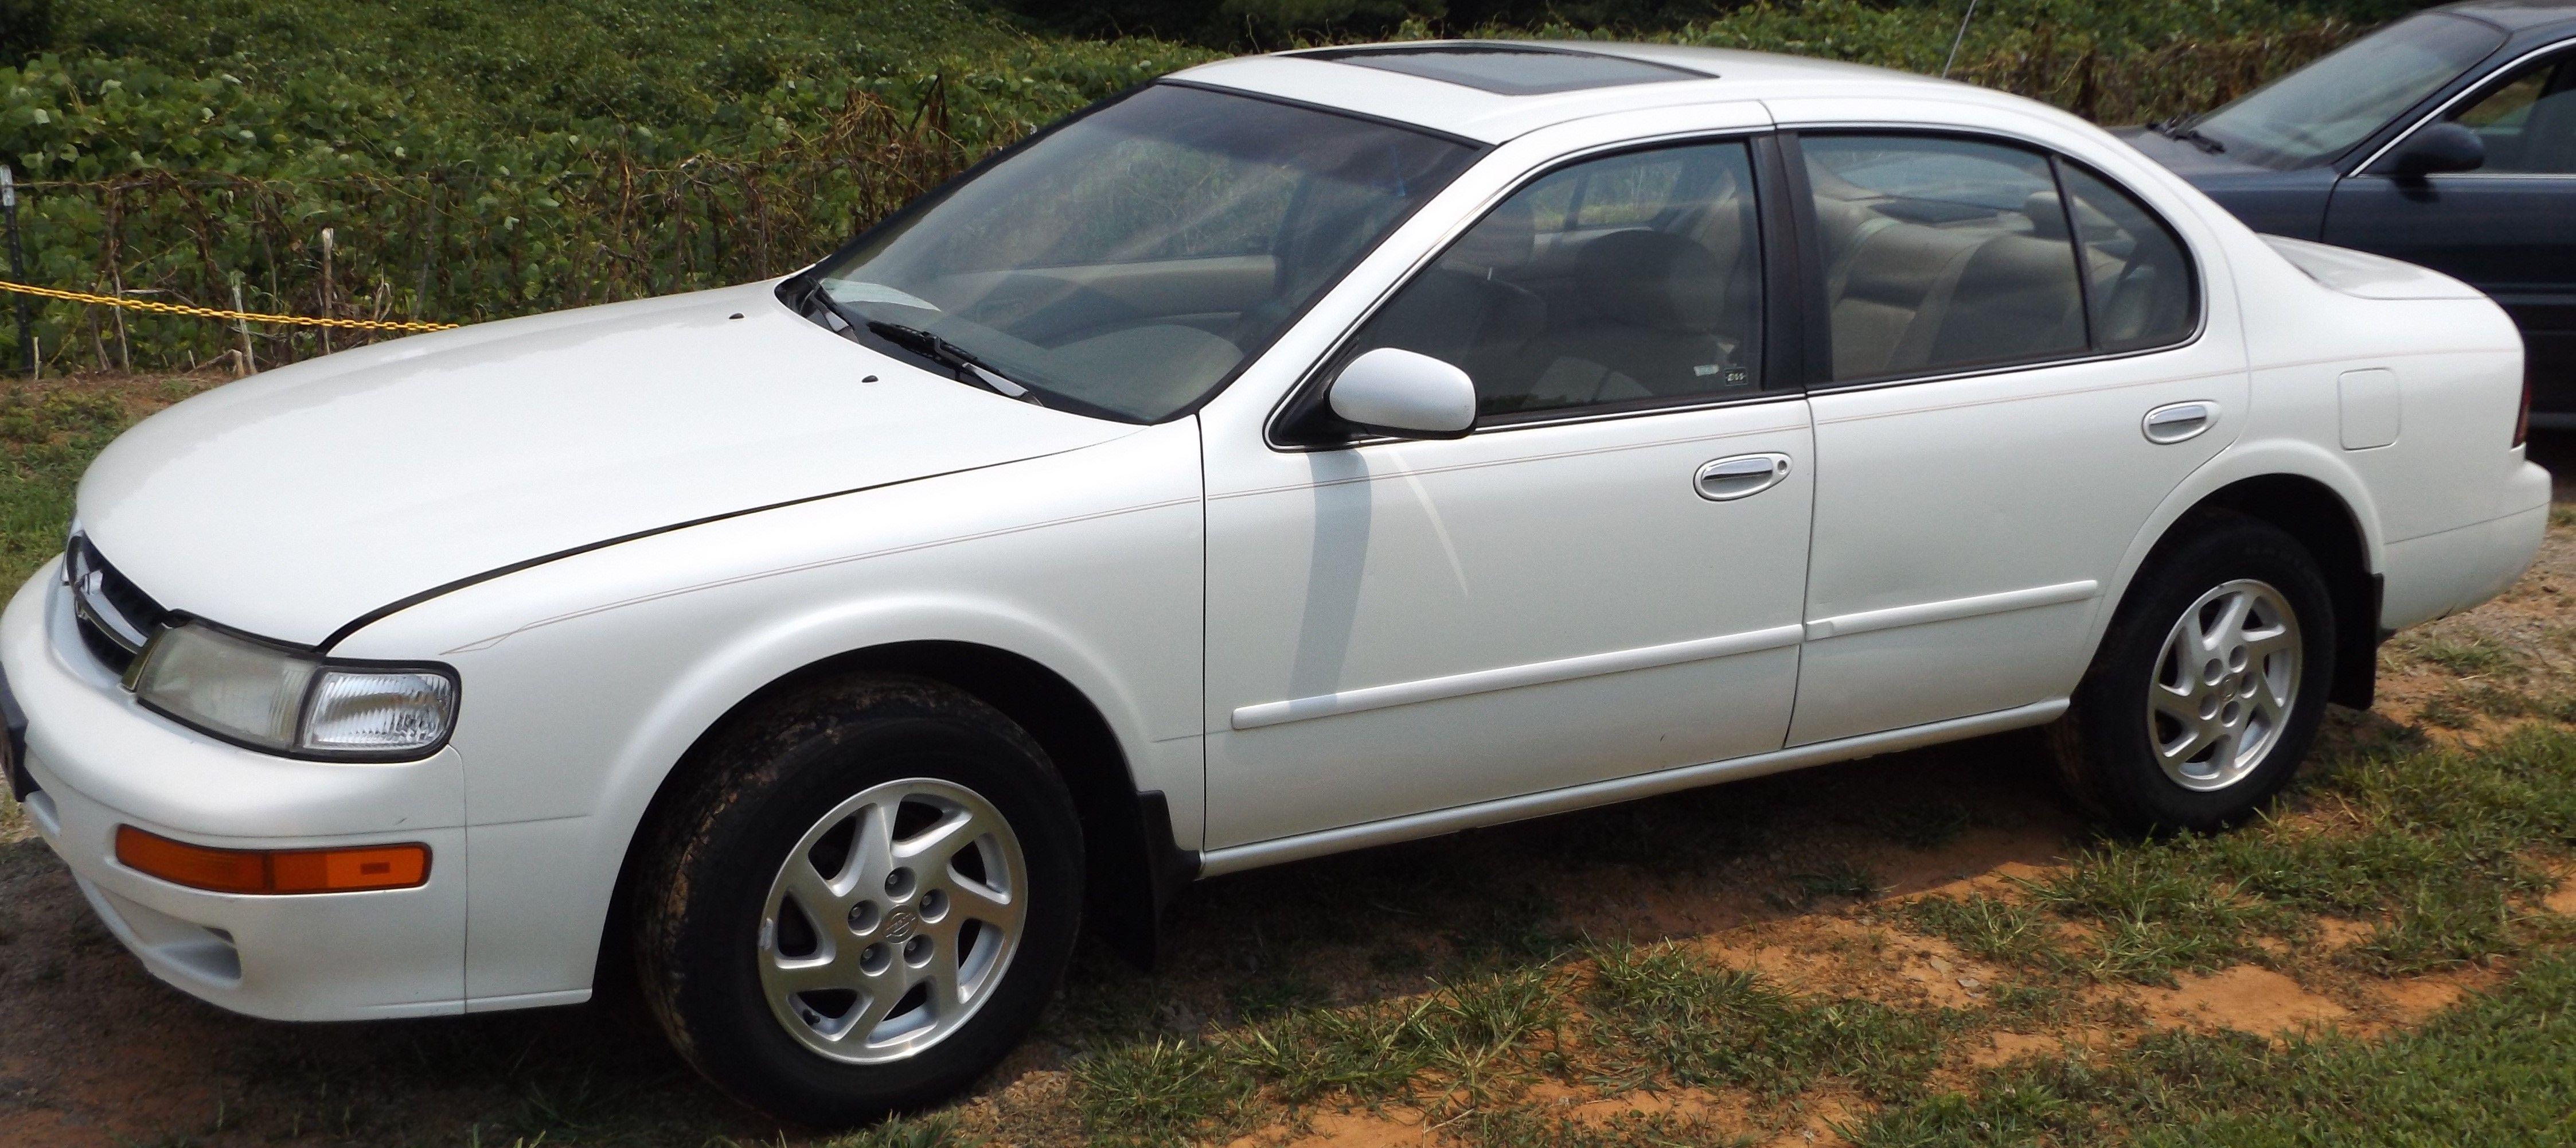 1999 Nissan Maxima GLE - $2,400  Located at Golden Auto